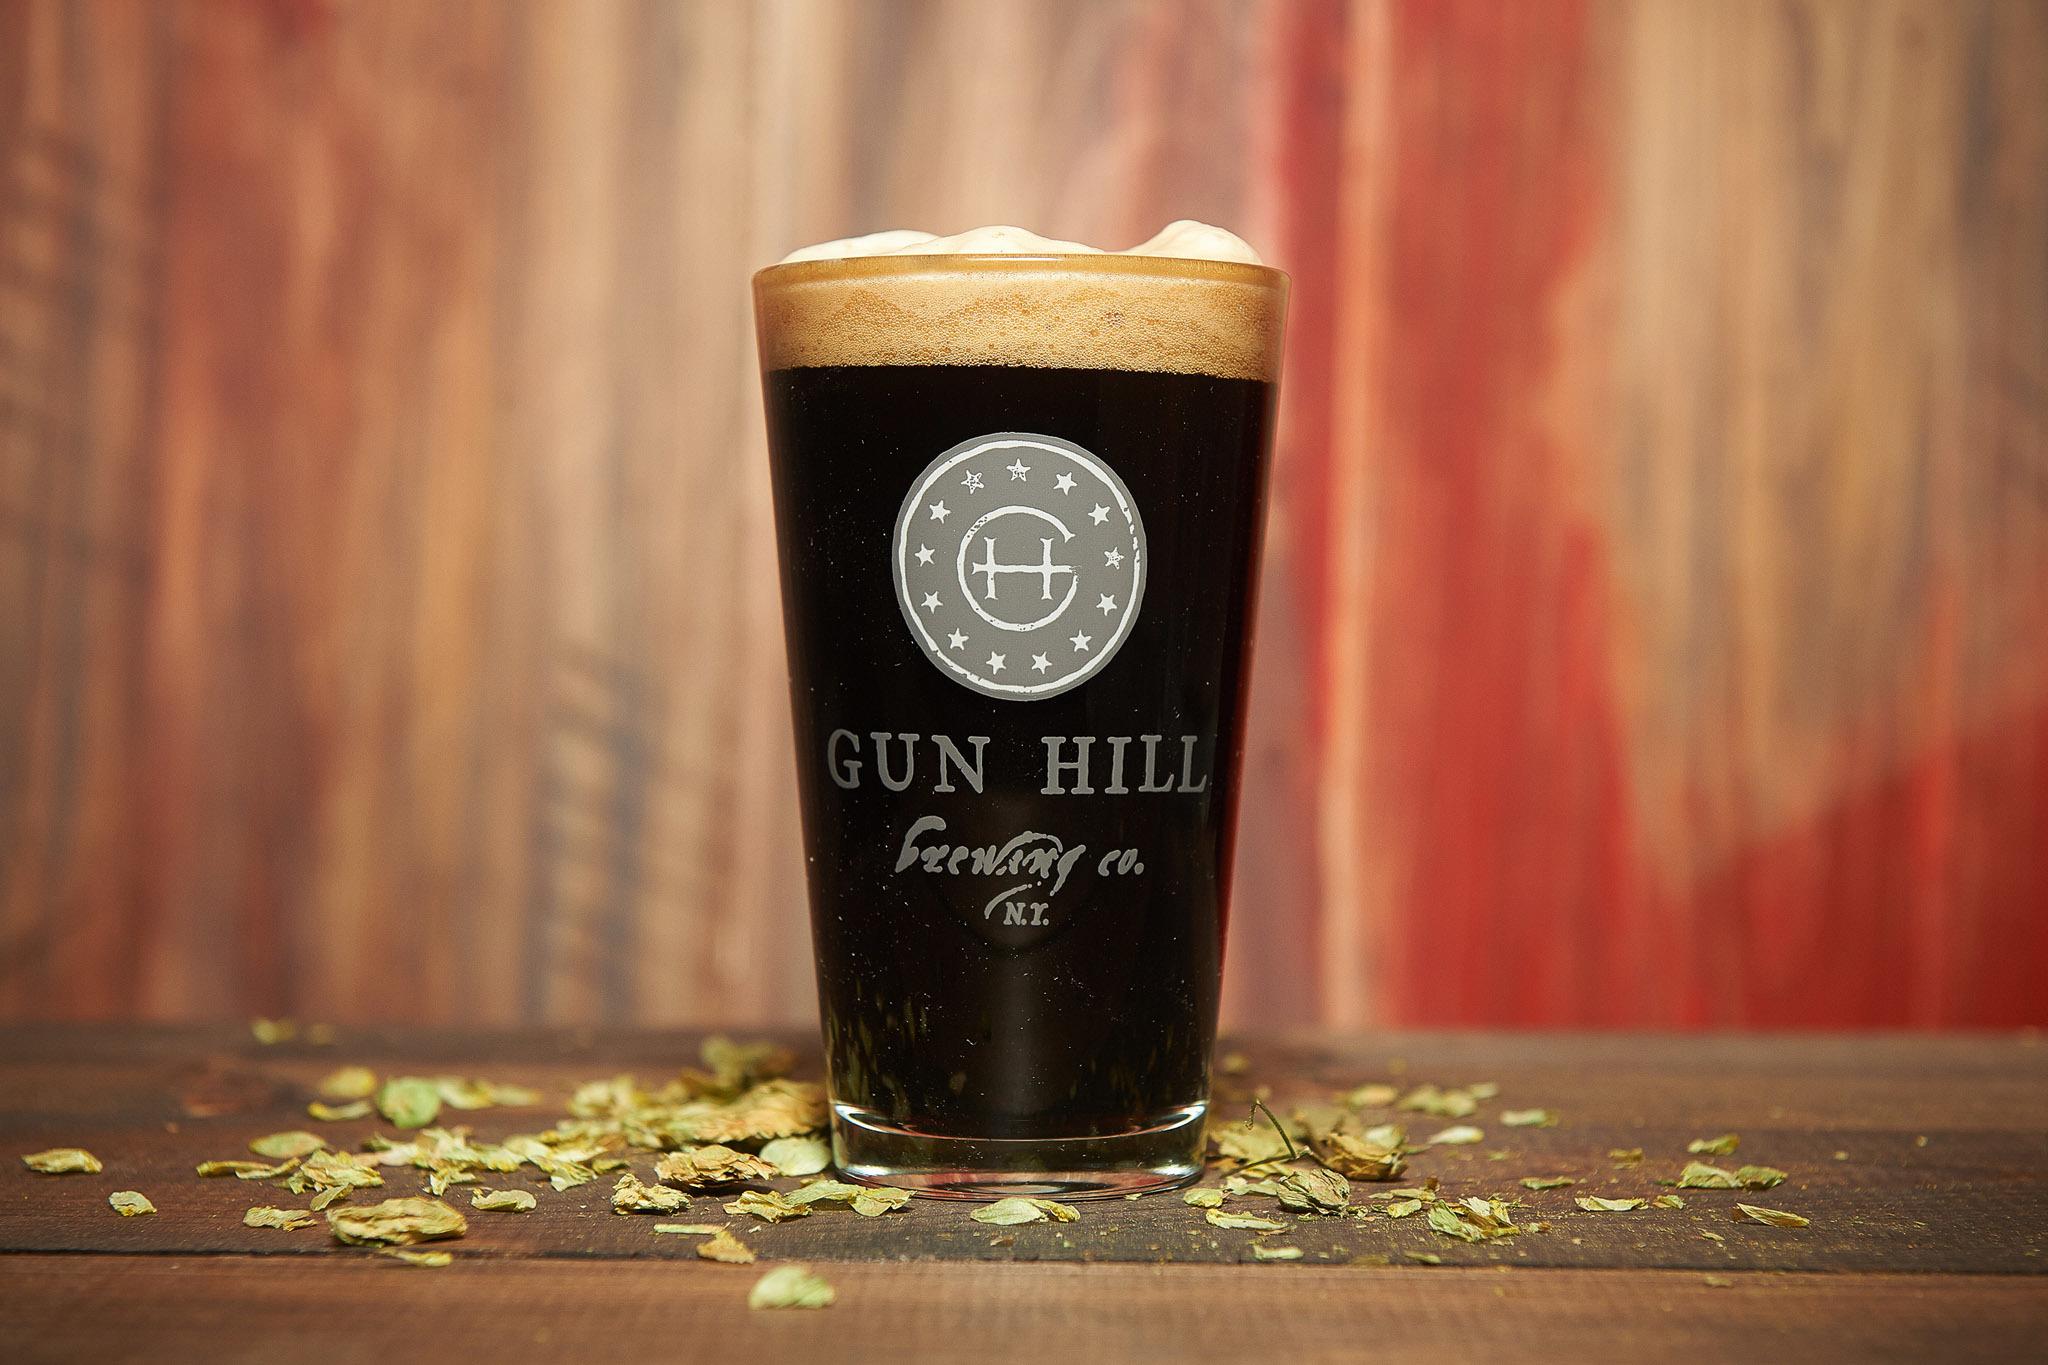 <p>Thunderdog Stout at Gun Hill Brewing Co.</p>